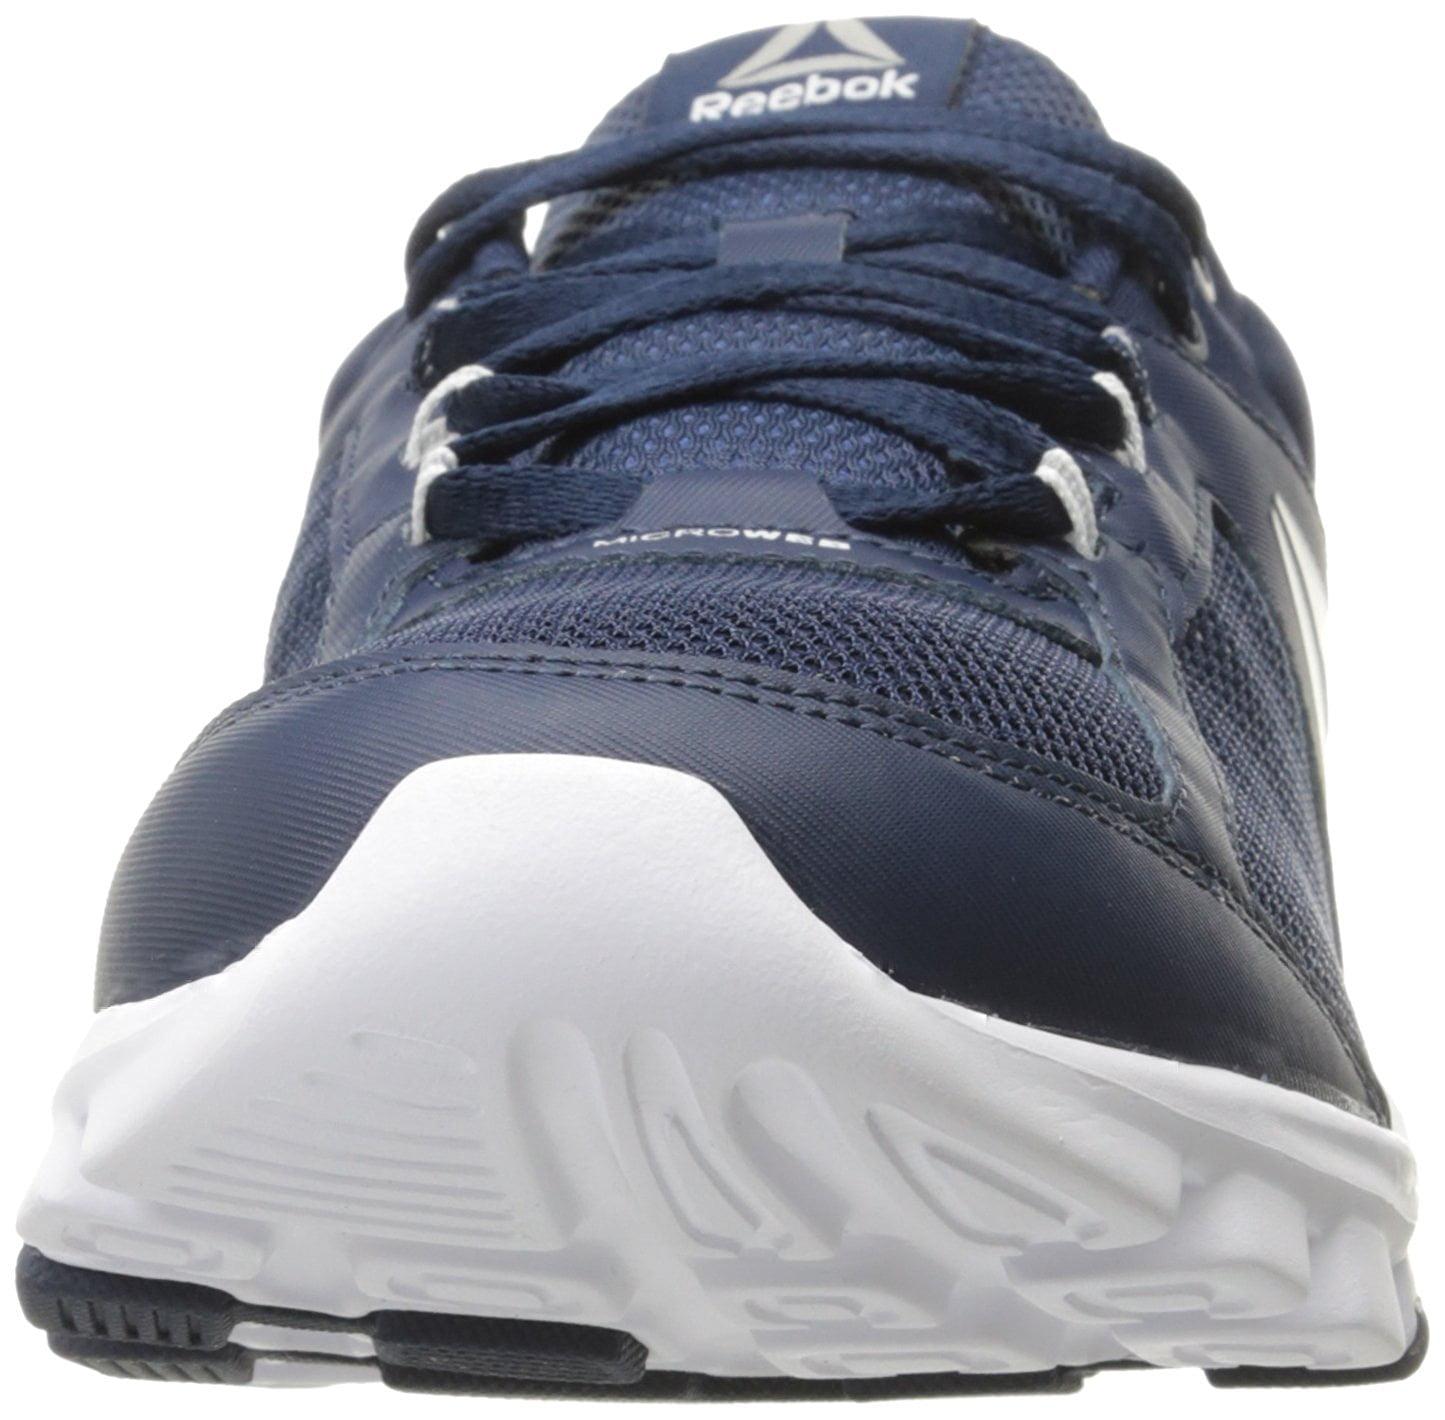 Reebok - Reebok Men Premier Comfort MemoryTech Yourflex Train 9.0 MT Running  Shoes - Walmart.com 0d9696f2f